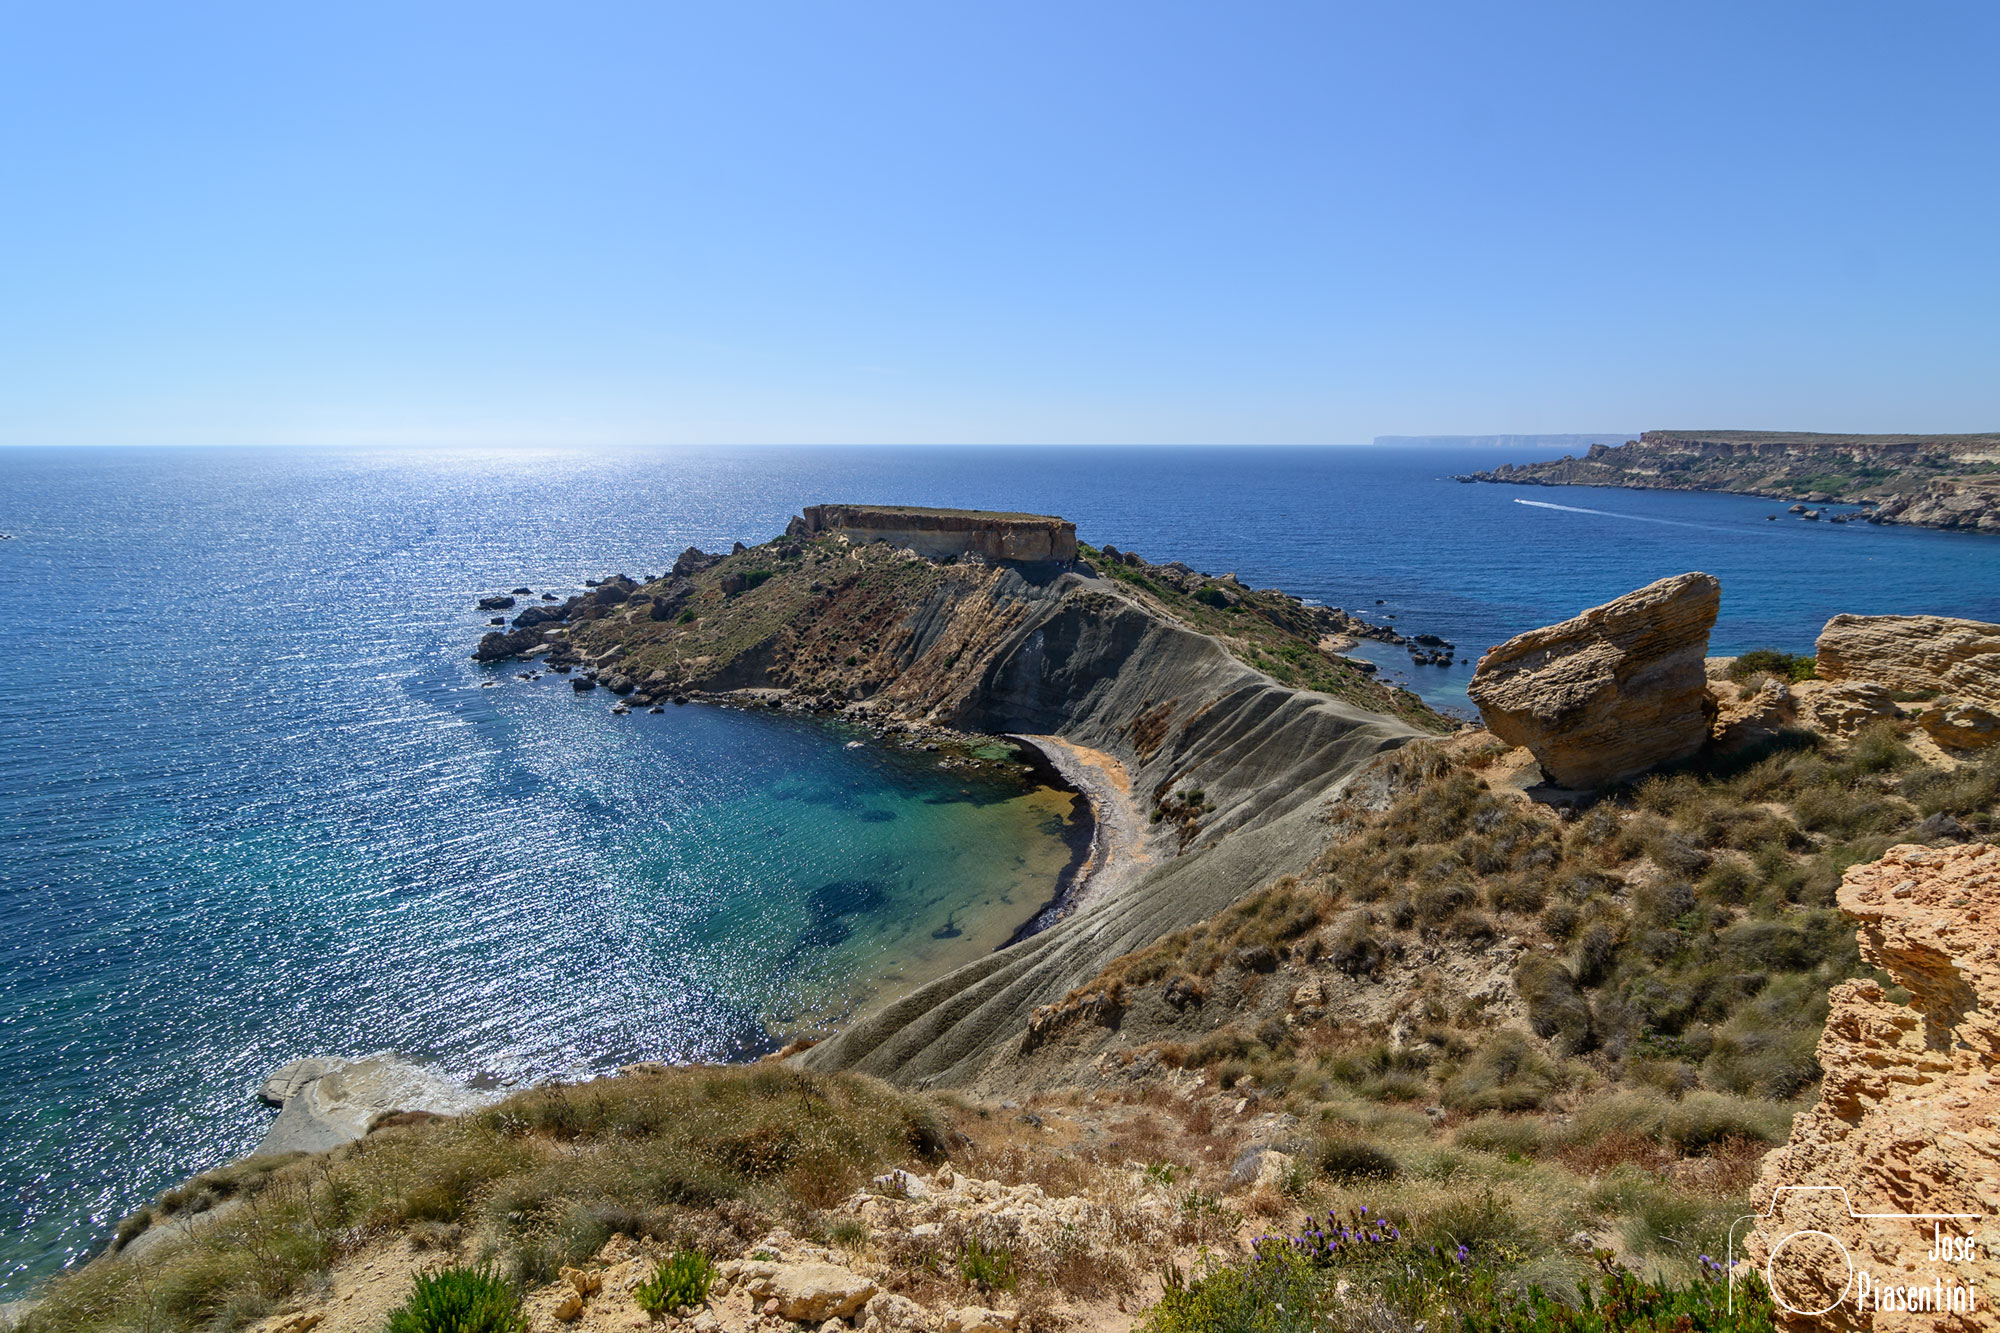 Malta Ghajn Tuffieha Bay